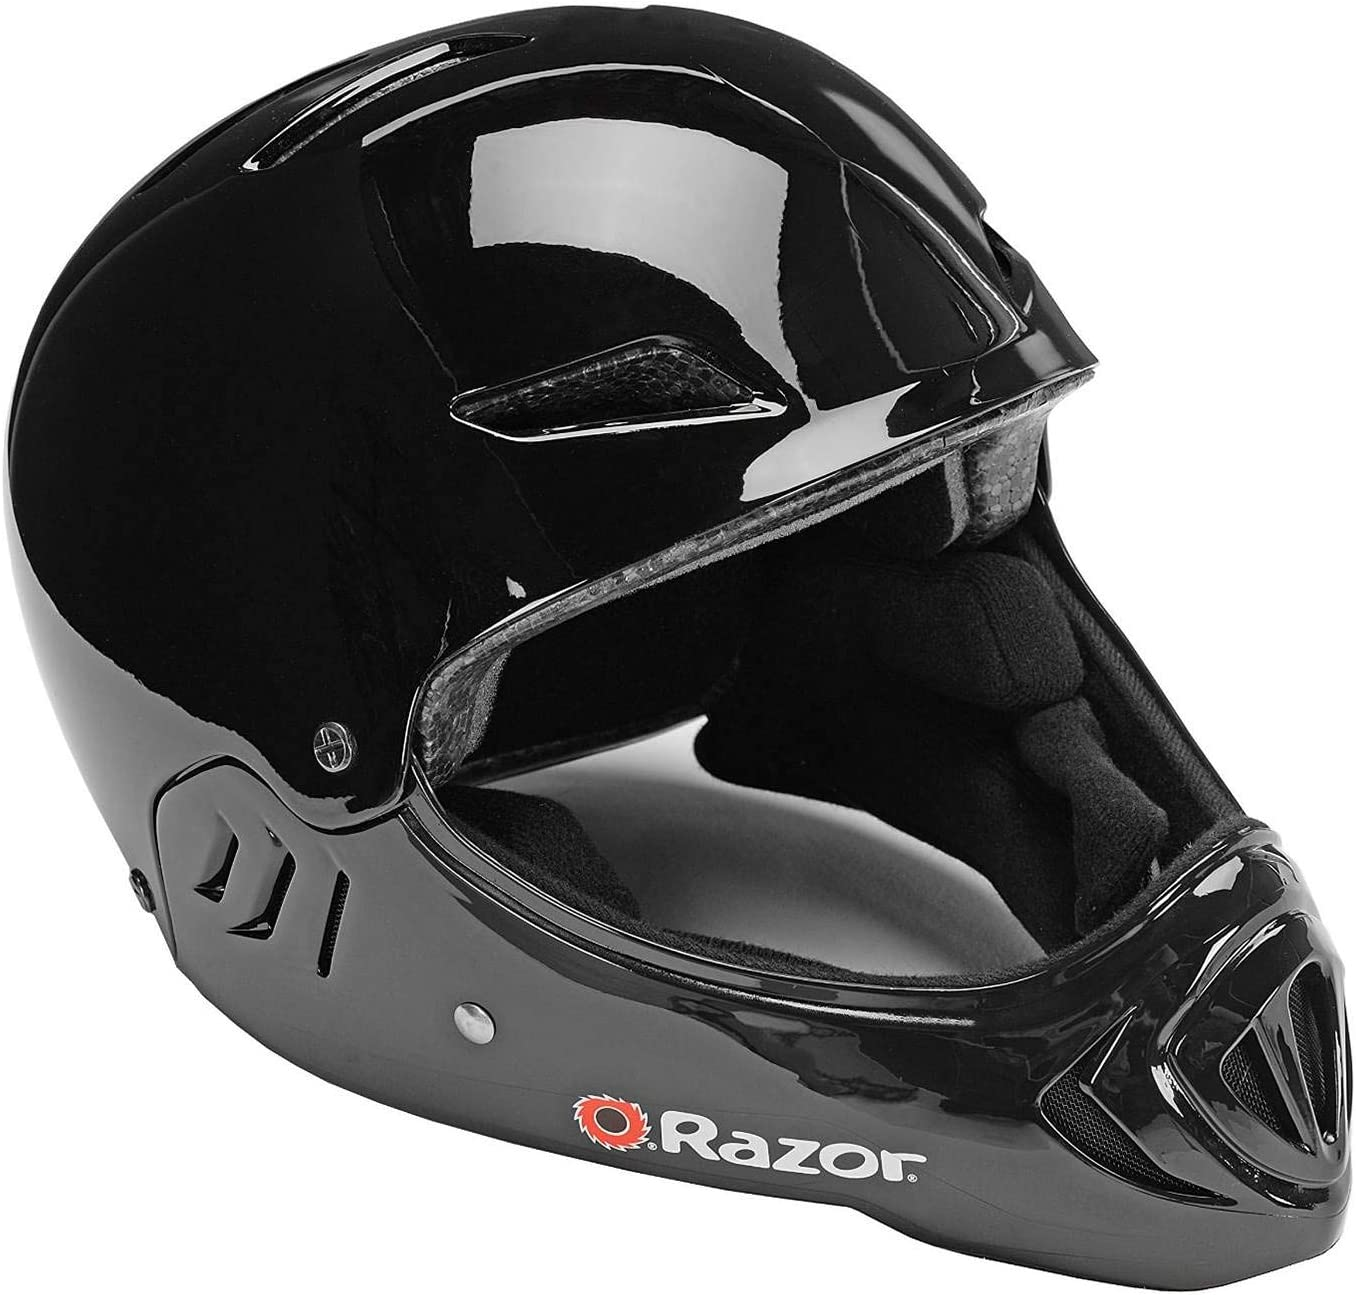 Lucid Red Razor Youth Kids Full Face Sport Bicycle Mountain BMX Bike Helmet